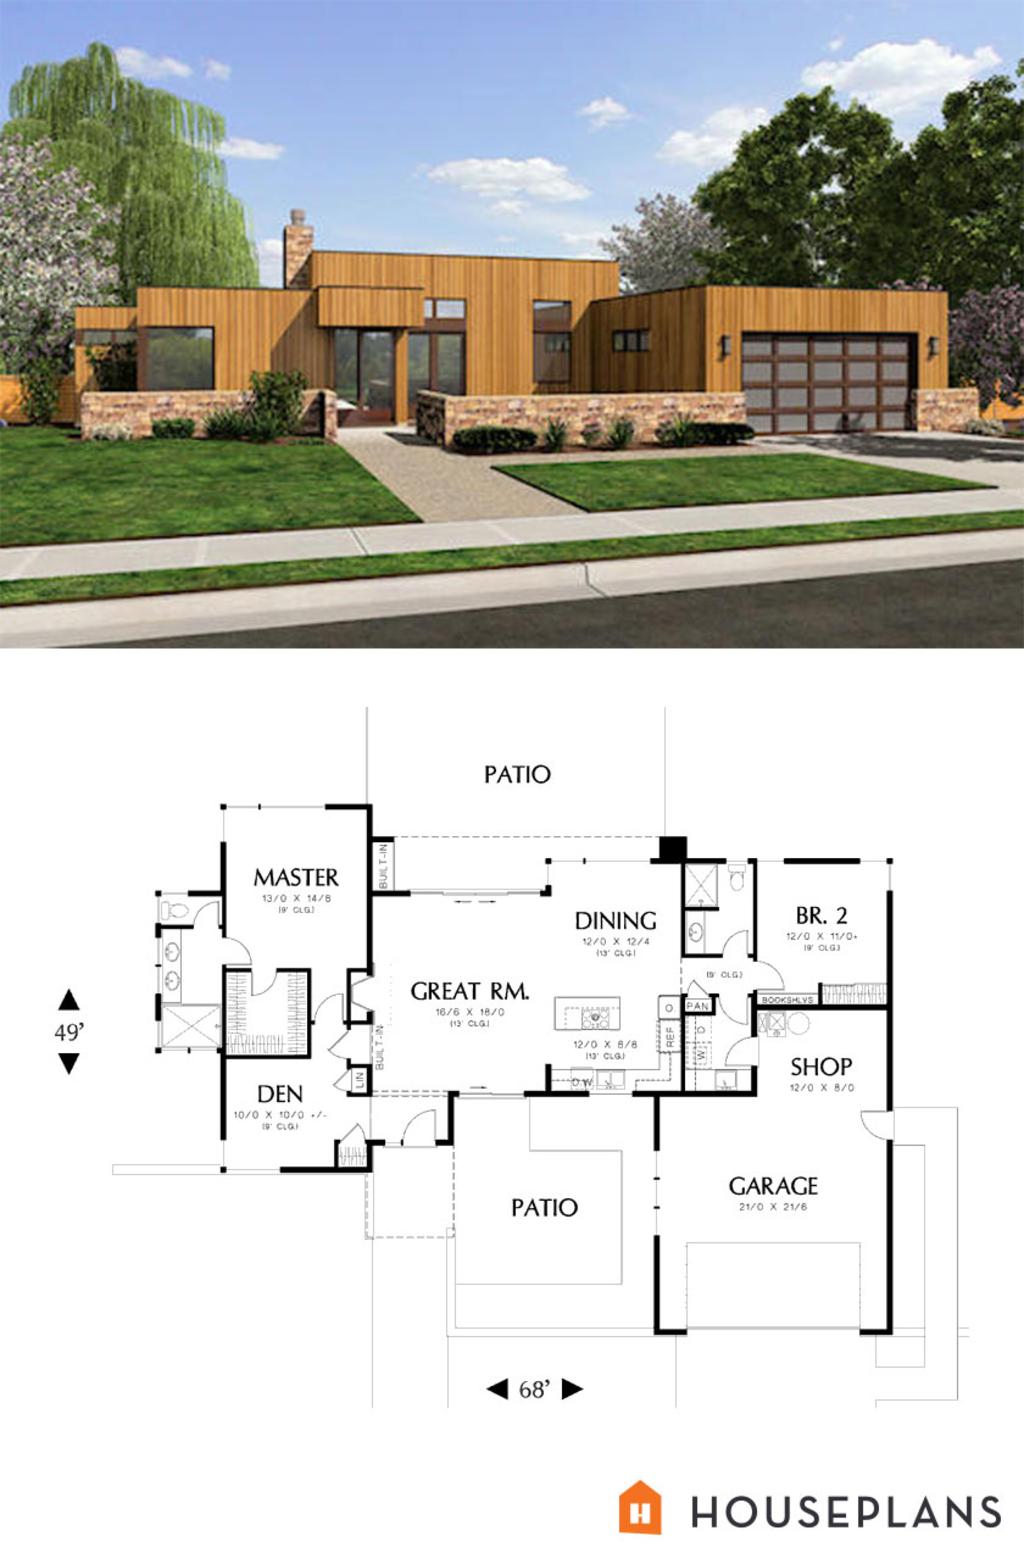 Modern Style House Plan 2 Beds 2 Baths 1508 Sq Ft Plan 48 505 Modern Style House Plans House Plans Mid Century Modern House Plans